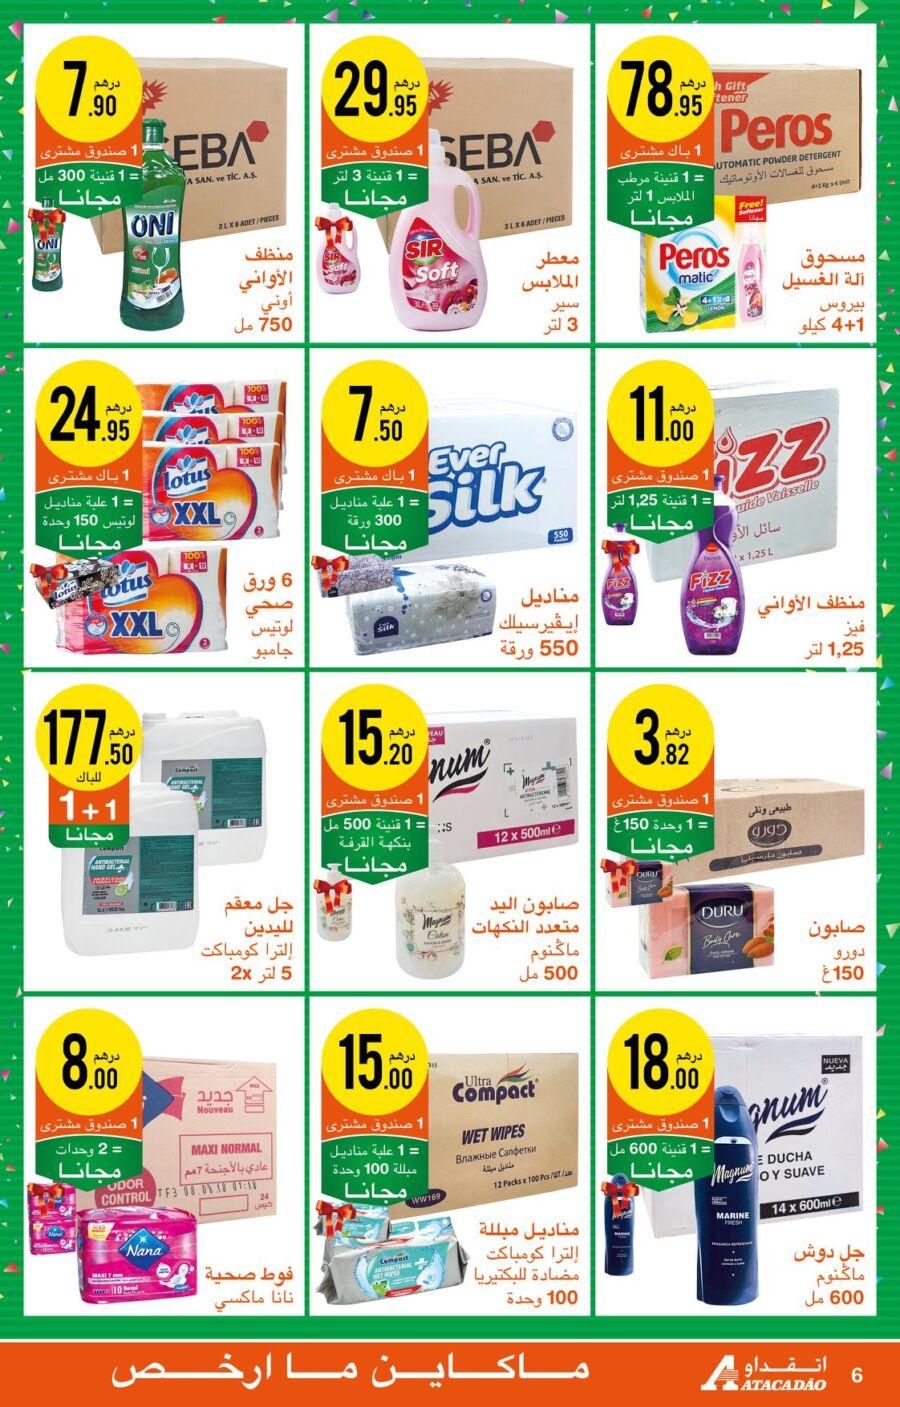 Catalogue Atacadao Maroc أيام الفابور du 27 Mai au 17 Juin 2021